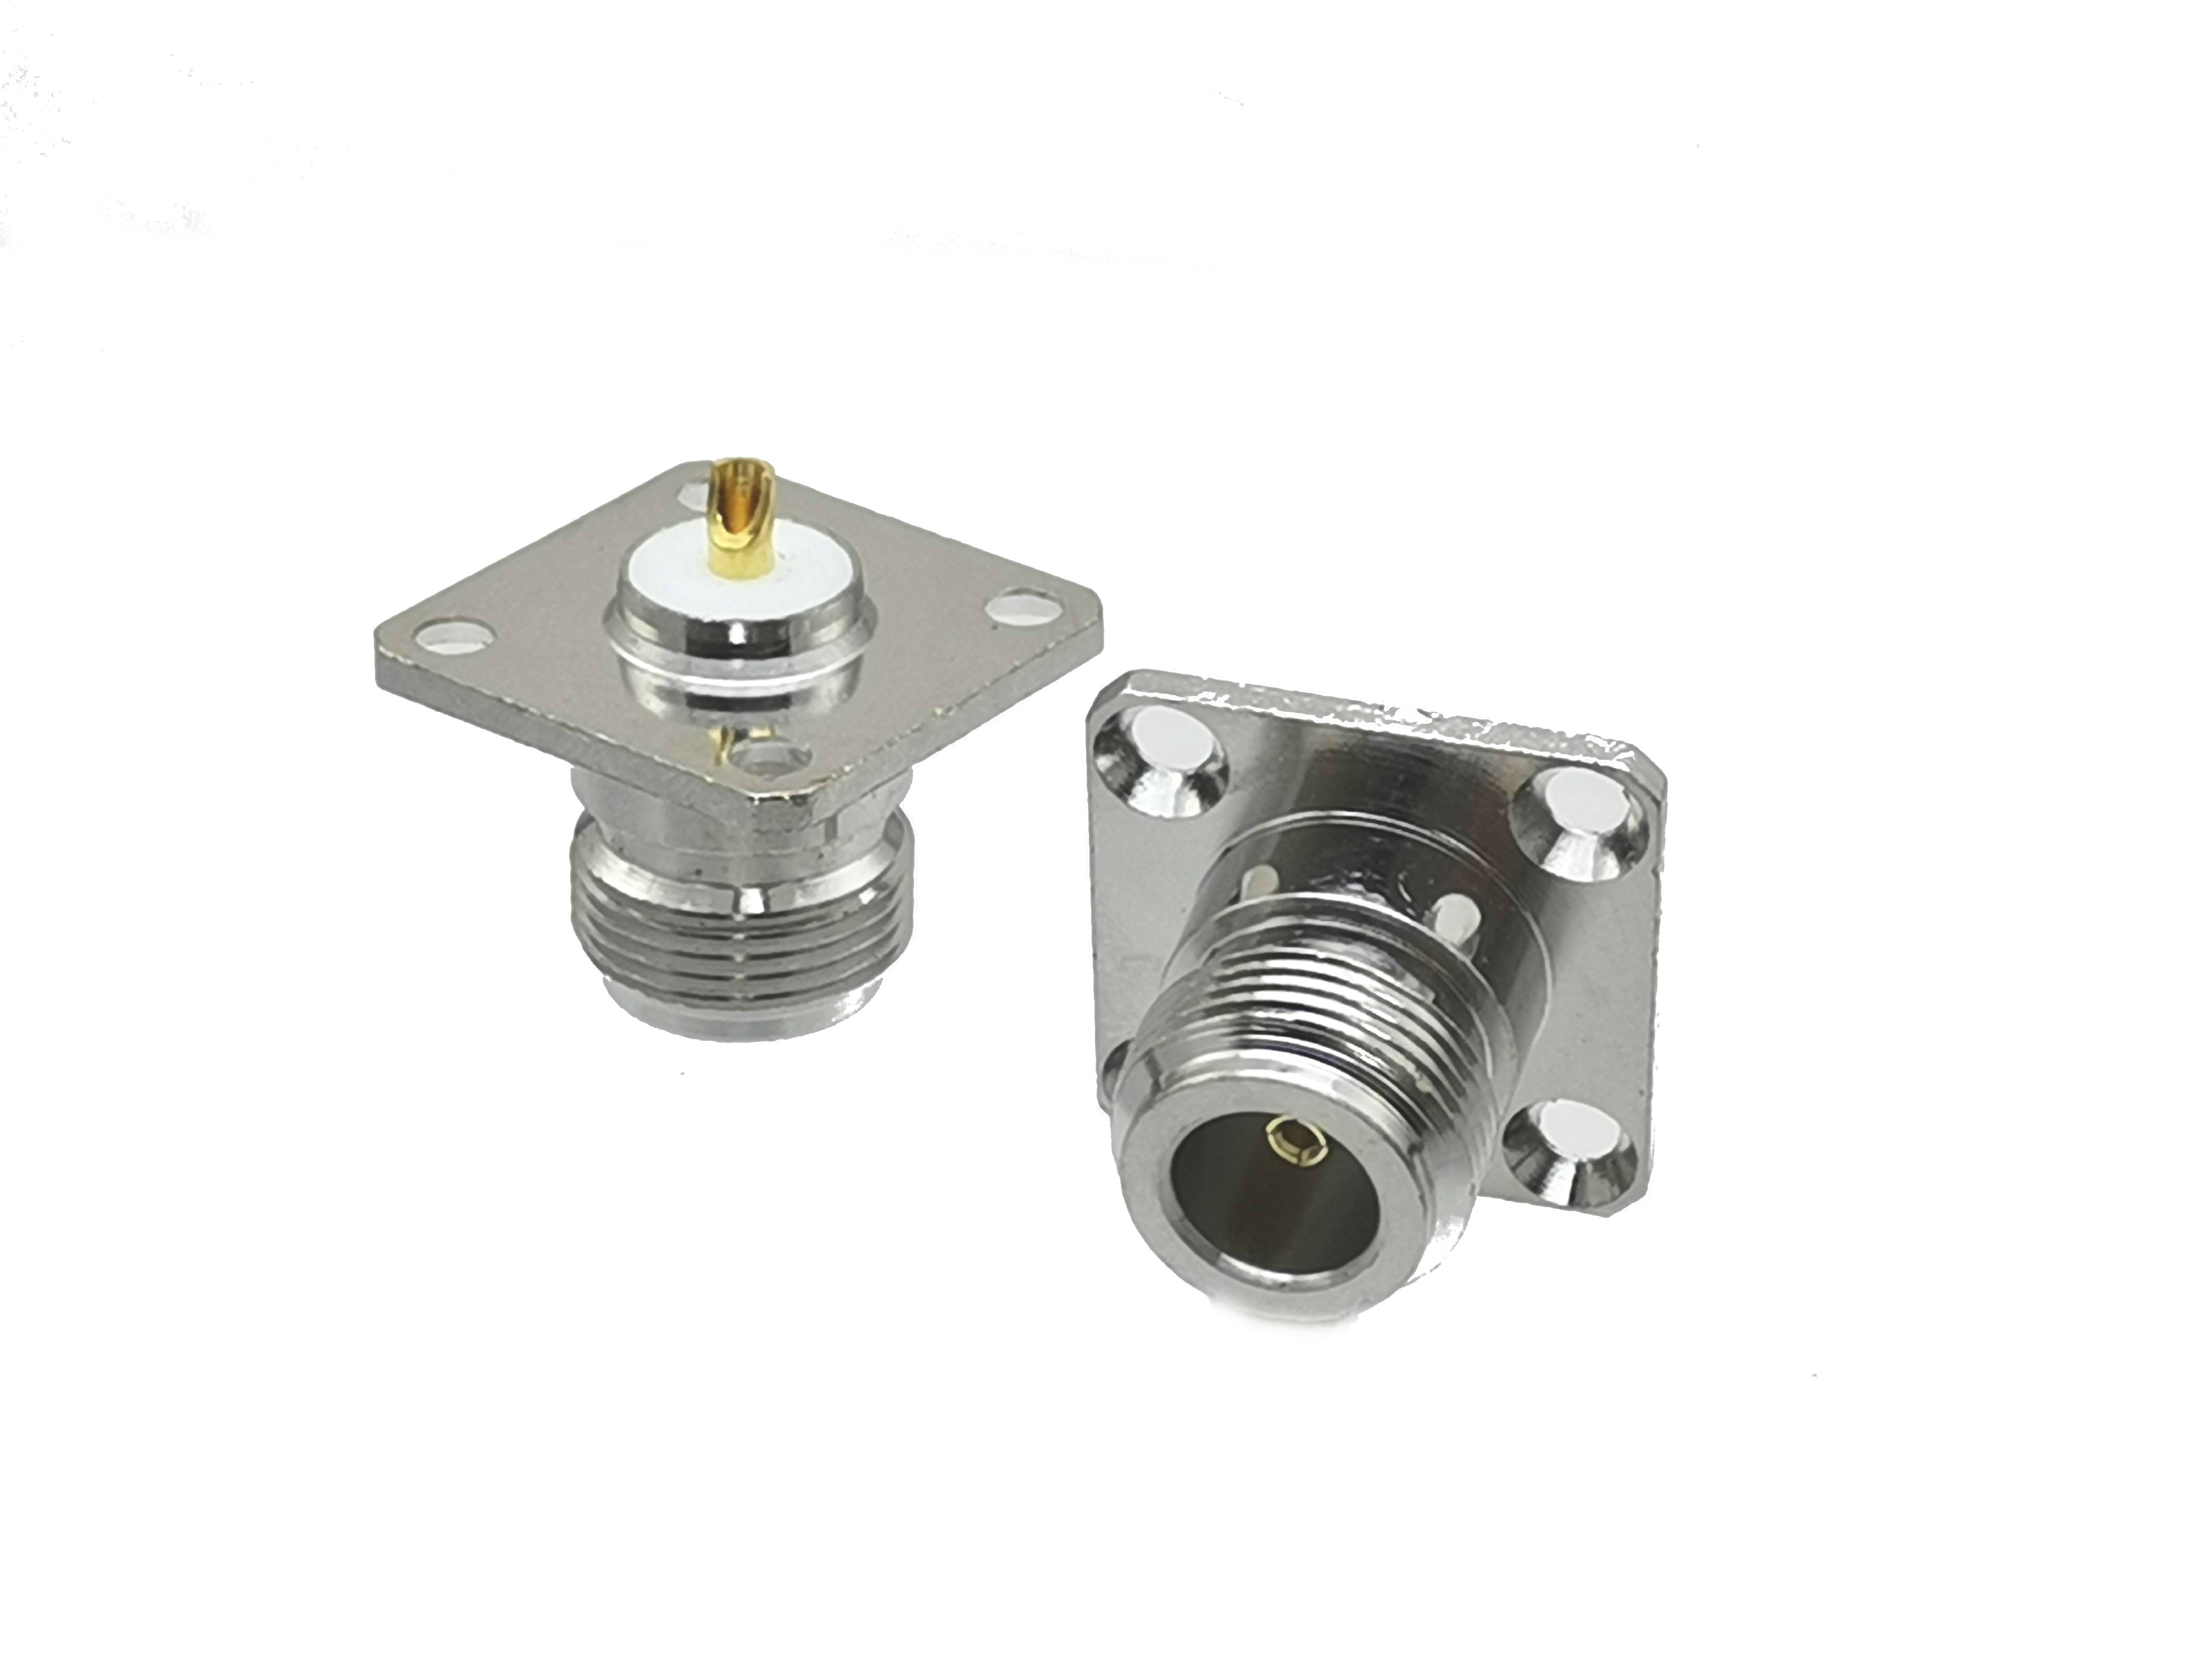 Conector N Hembra jack 4-hole 25,4mm brida montaje de panel de soldadura recta RF Coaxial